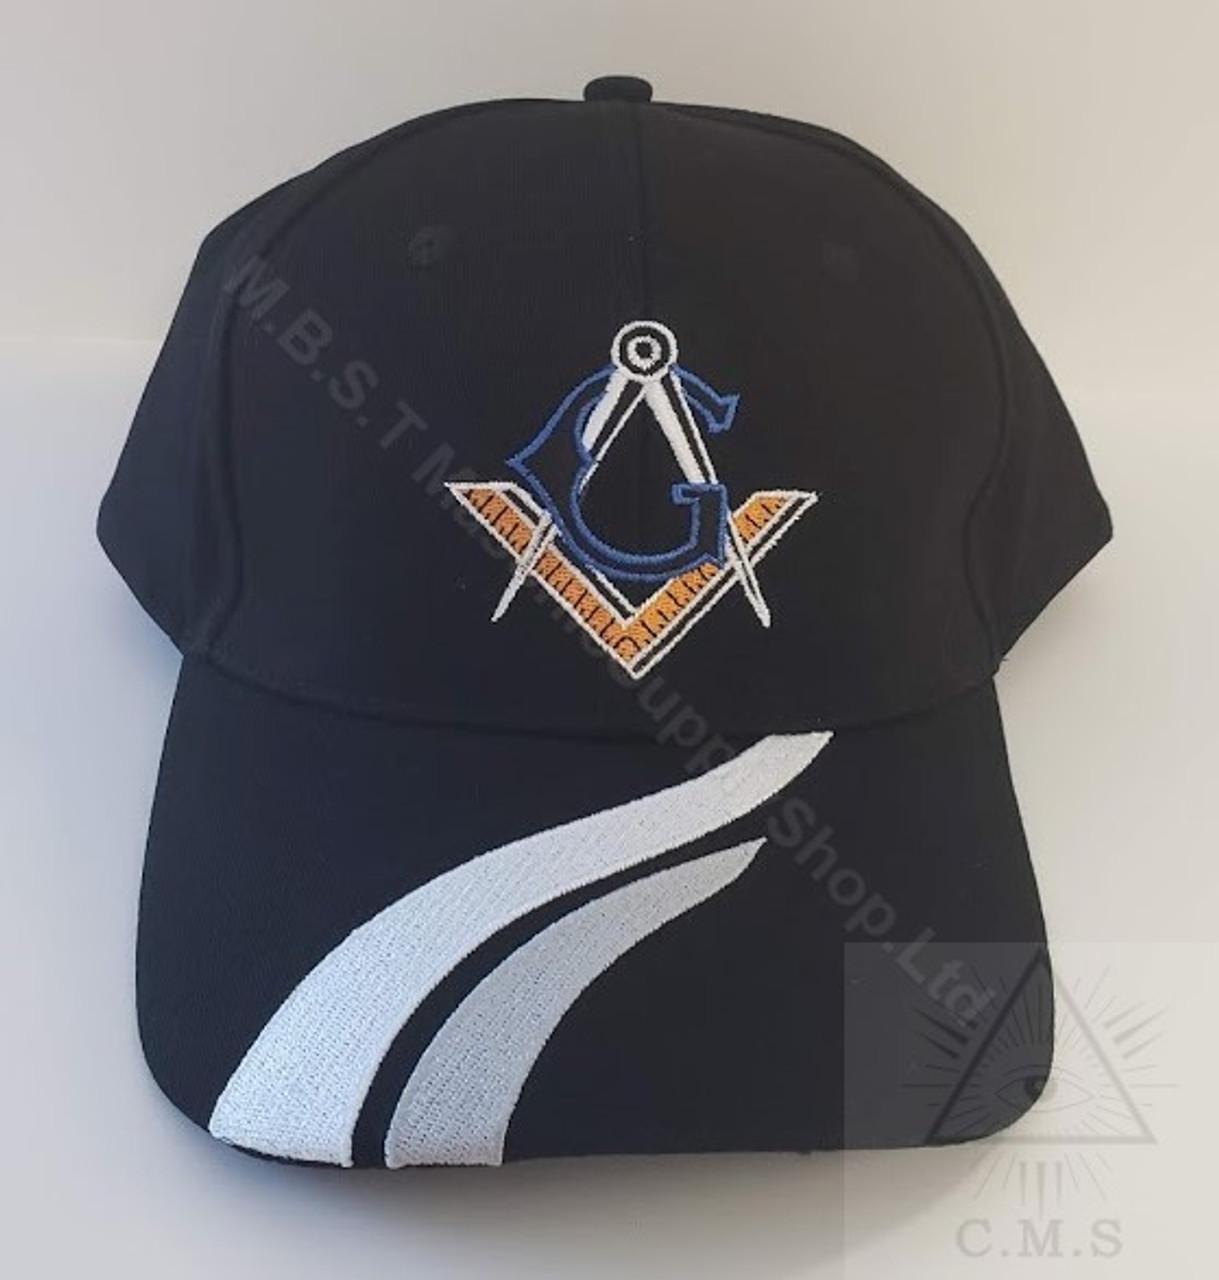 Masonic Base Ball hat · Masonic Base Ball hat · Masonic Baseball Hat Square  and Compass Plus G 8c47b5e5ceeb